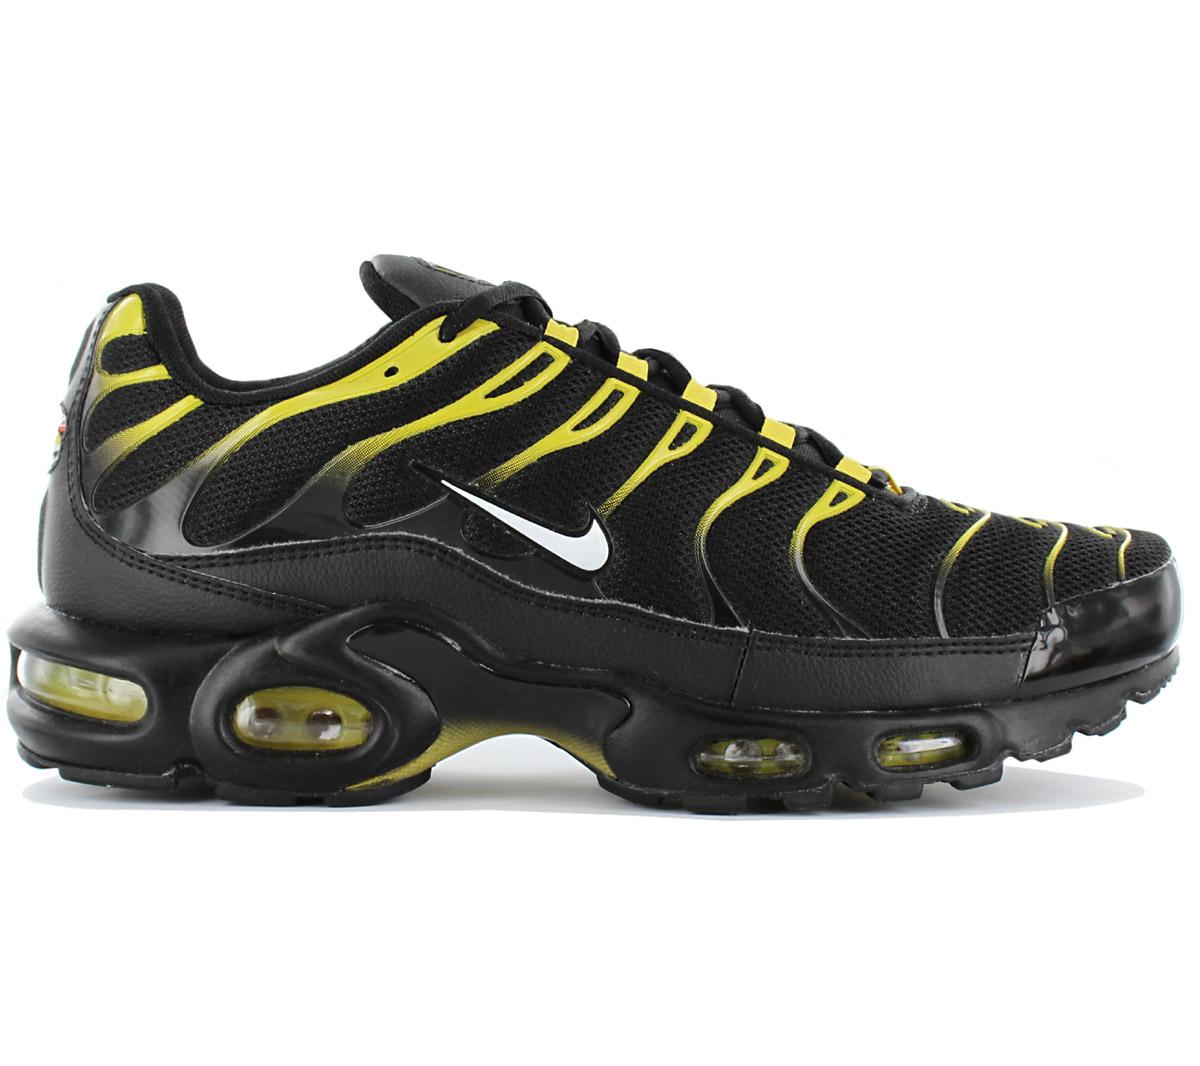 new styles 044b3 6395f 28 Nike Air Max Plus 852630-020 EU 41 US 8